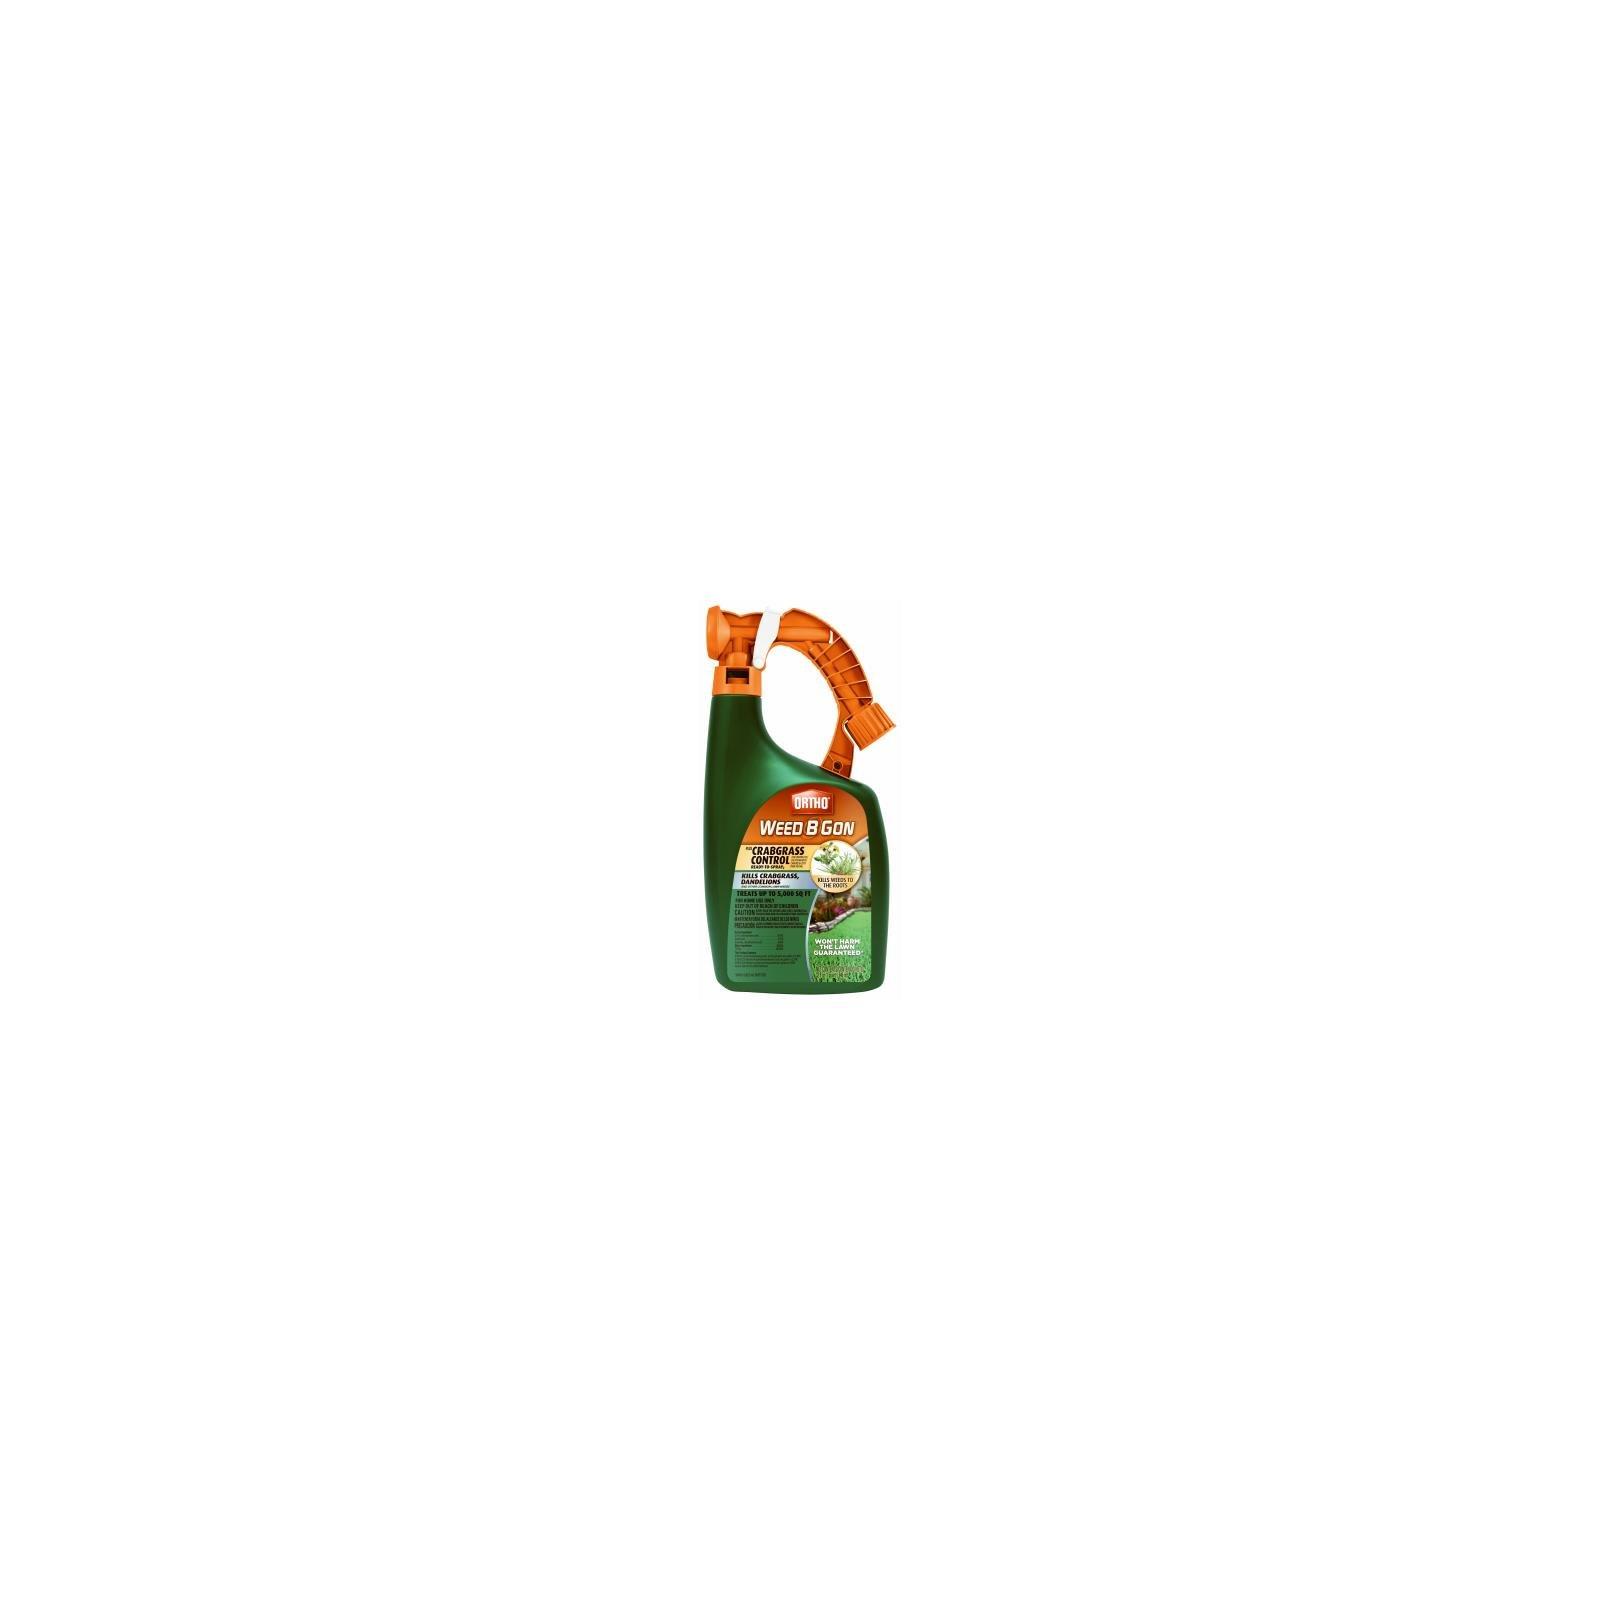 Weed-B-Gon Crabgrass Control 32 Oz